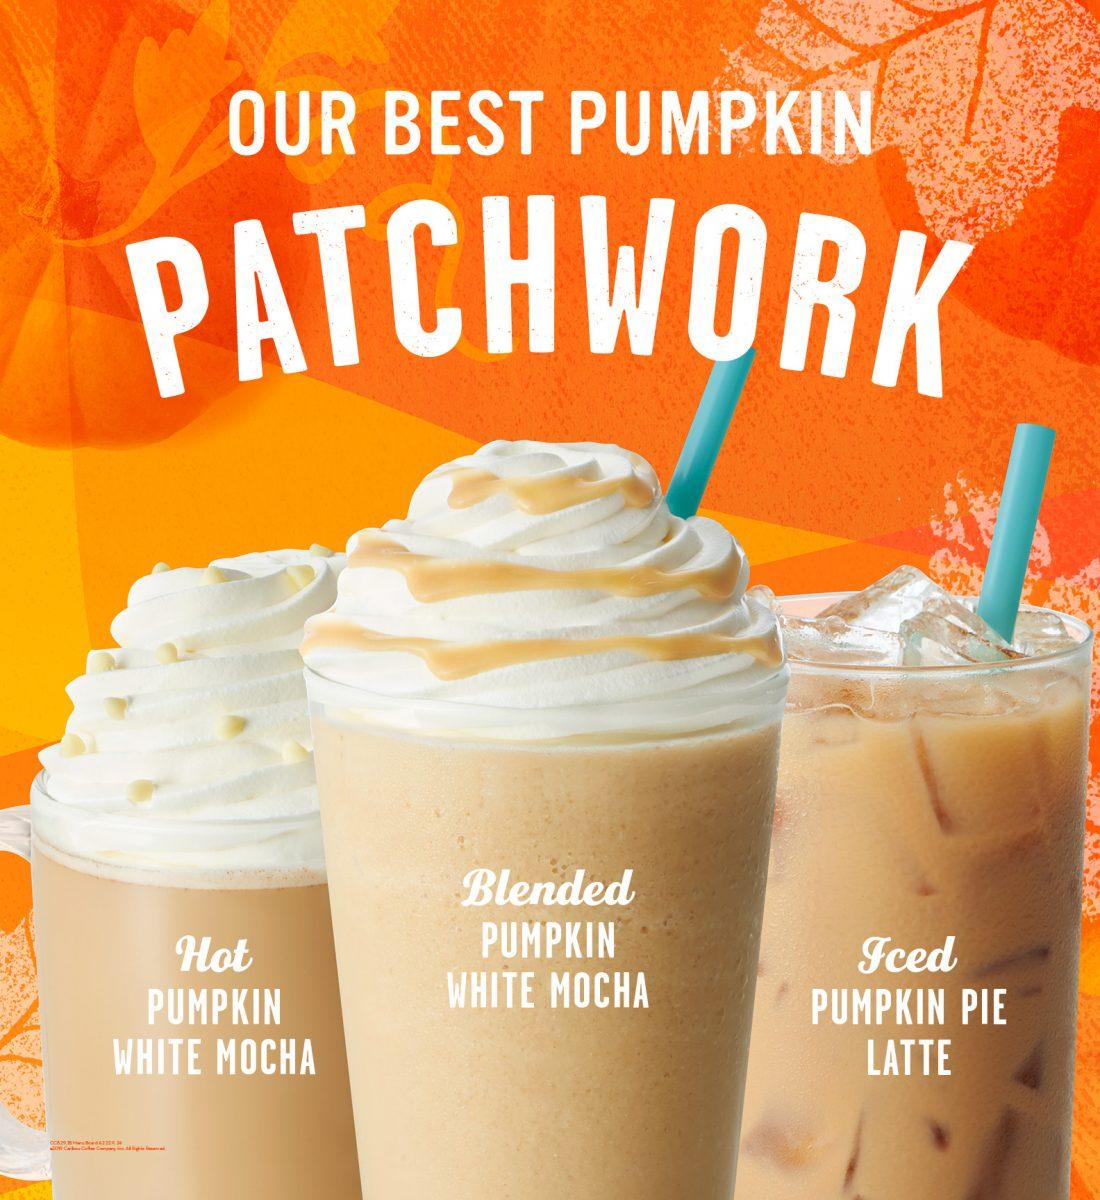 Our Best Pumpkin Patchwork